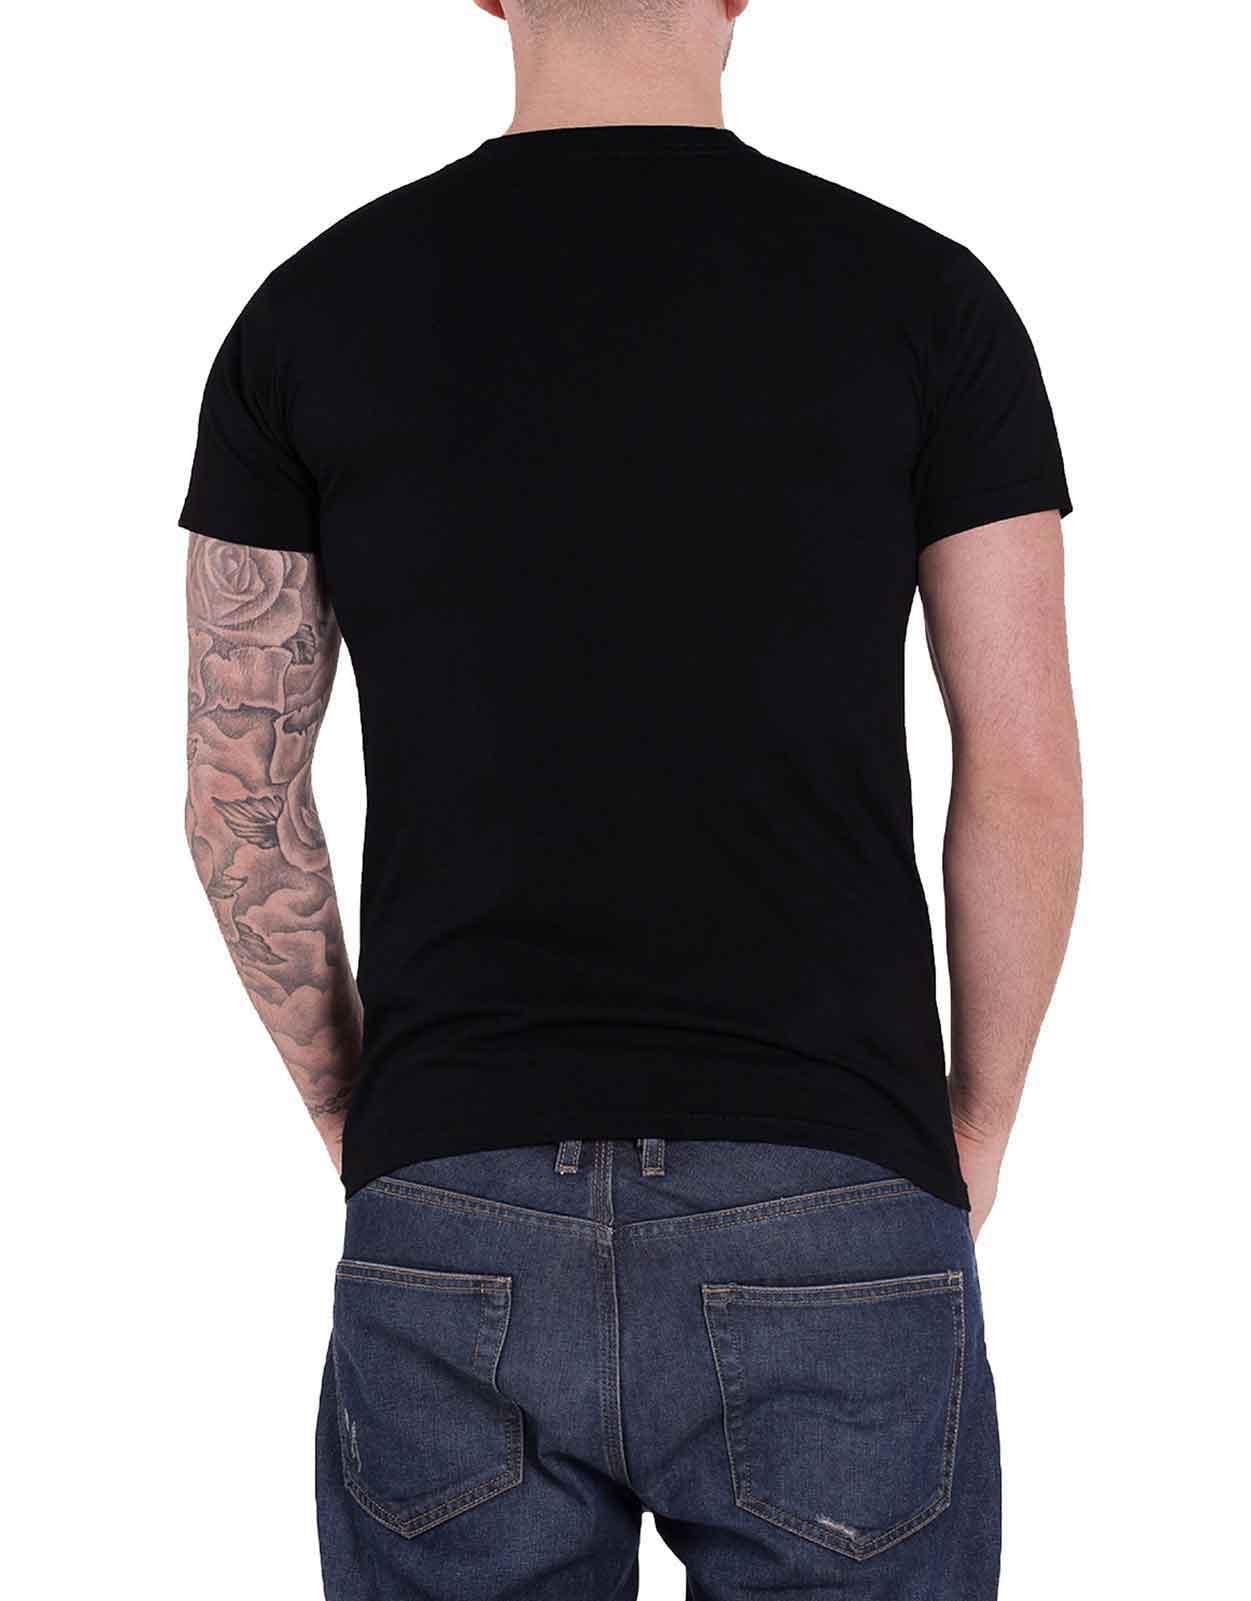 Officiel-Metallica-T-shirt-filaire-justice-for-all-RTL-Band-Logo-Homme-Nouveau miniature 9